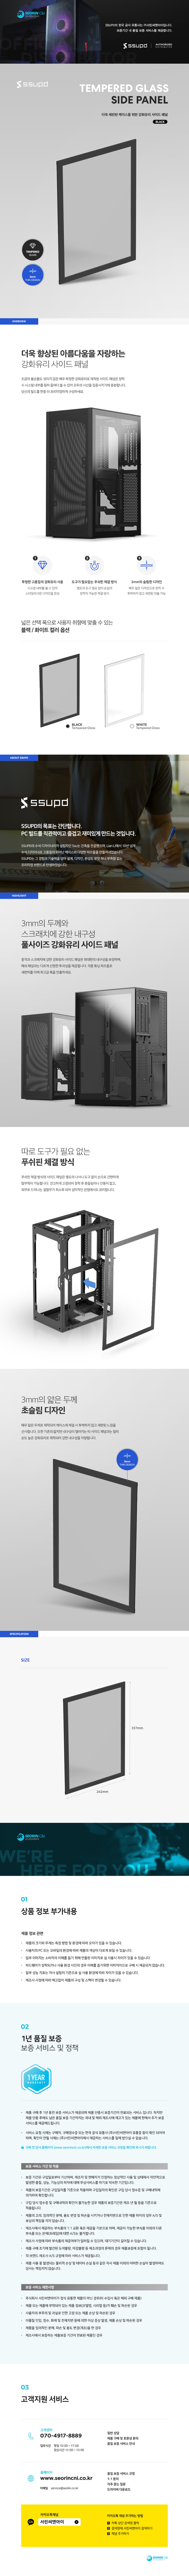 SSUPD MESHLICIOUS 강화유리 사이드패널 (Black)